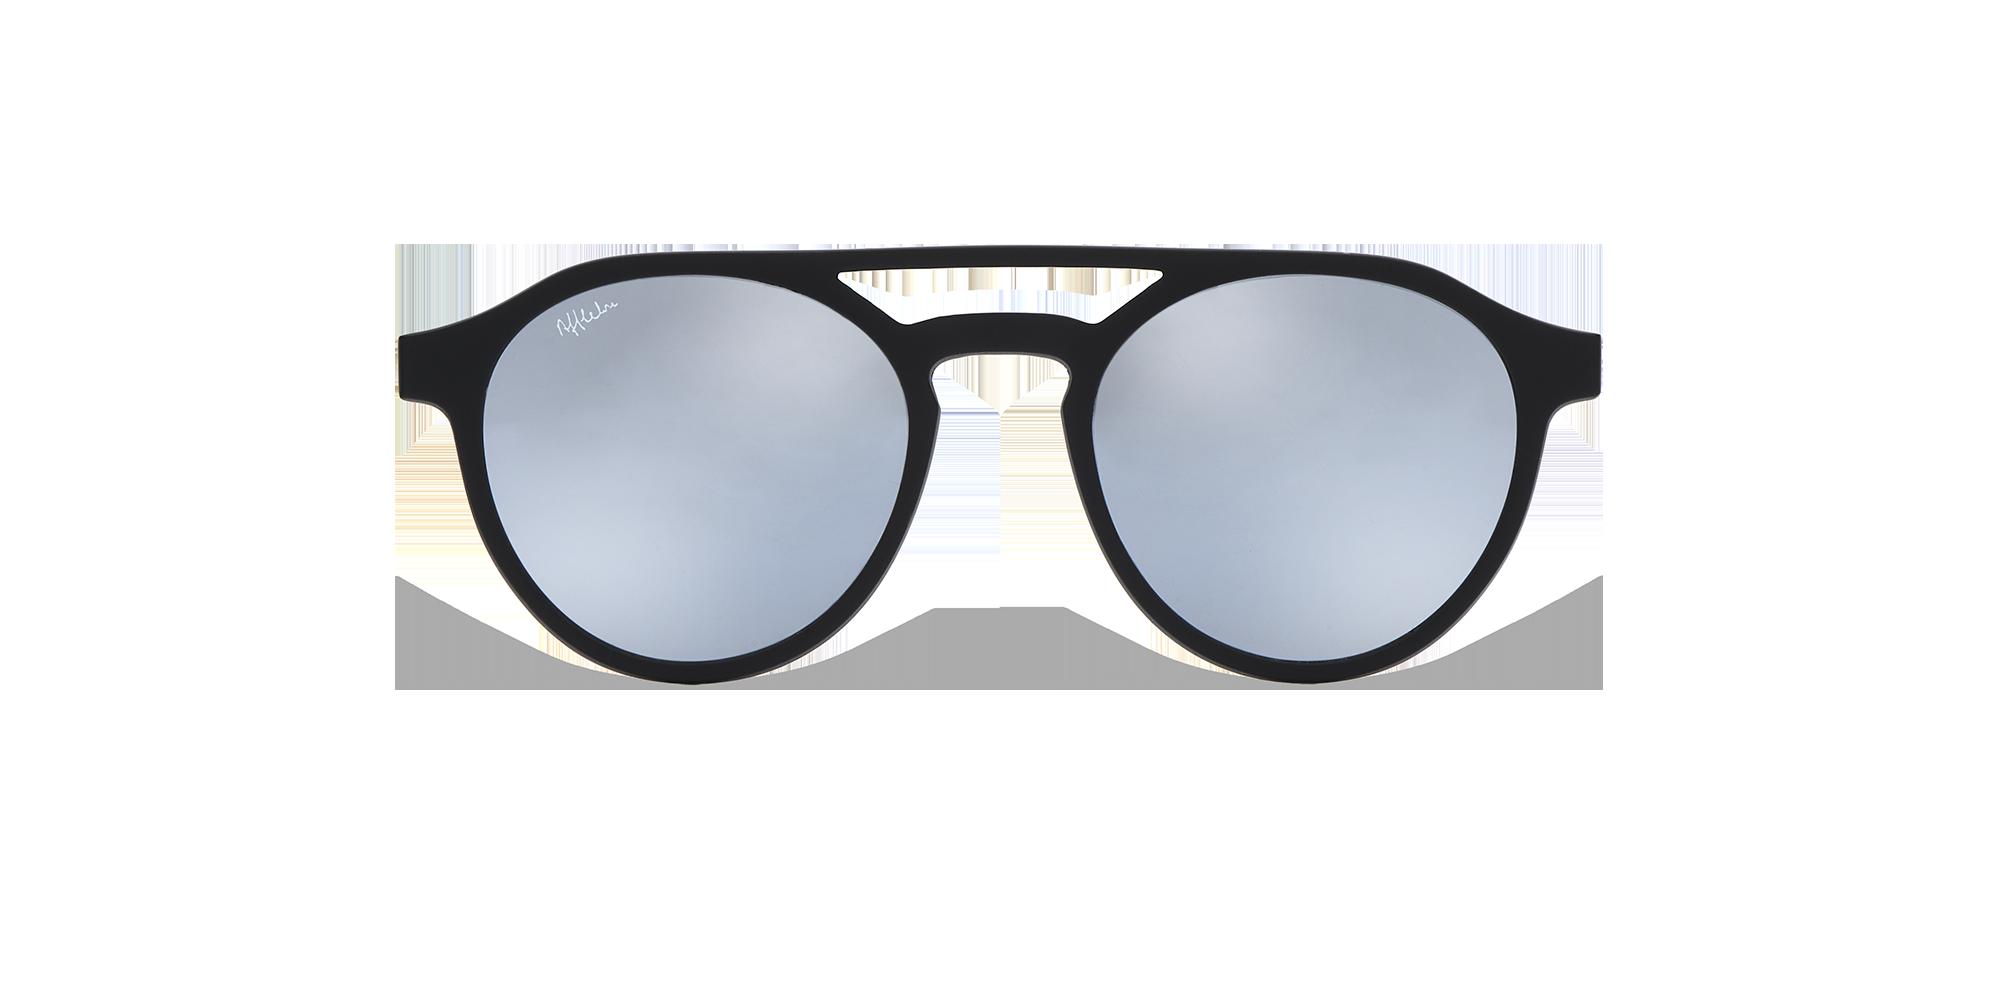 afflelou/france/products/smart_clip/clips_glasses/07630036429112_face.png